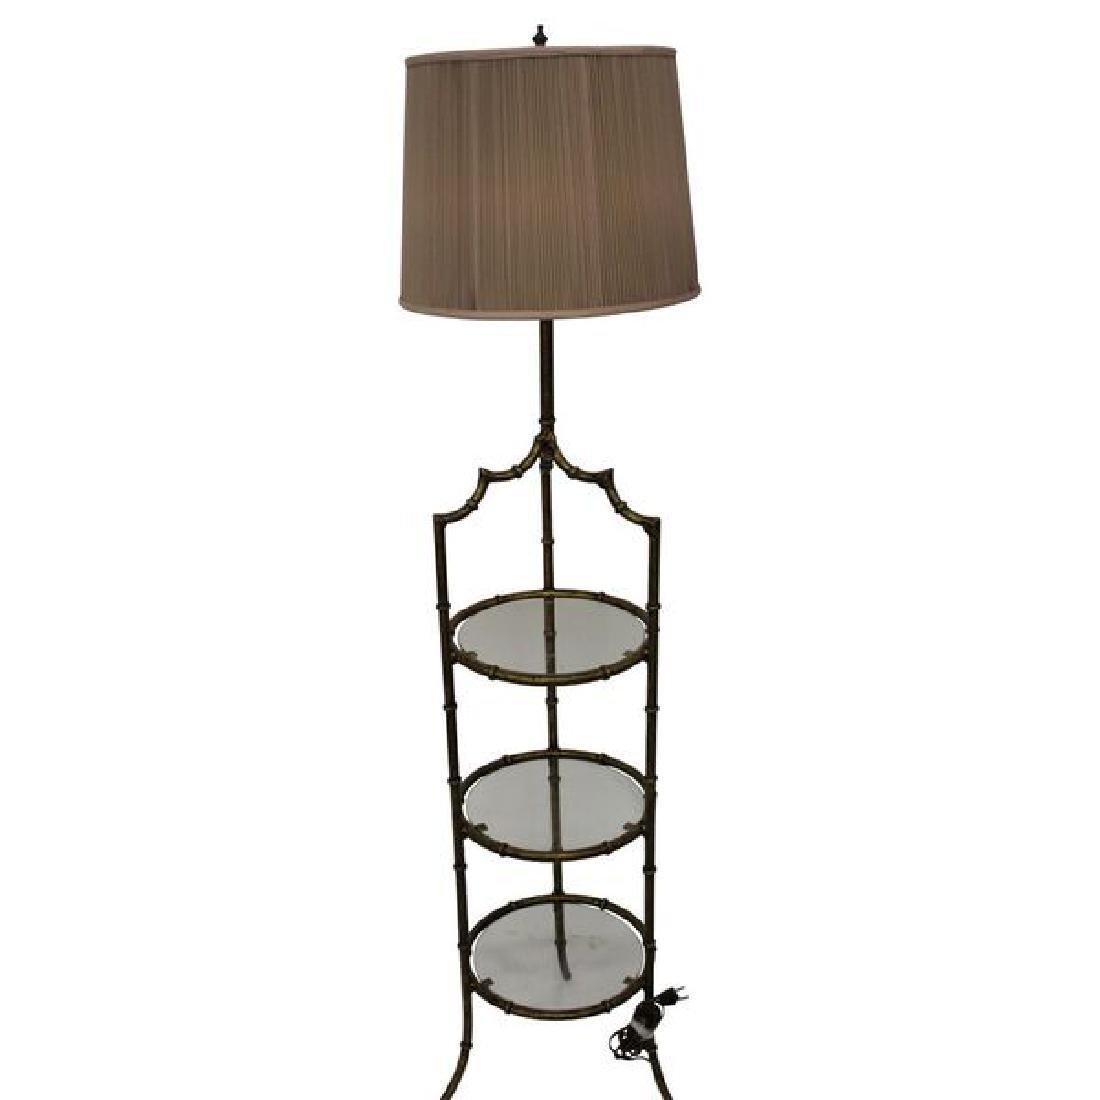 Mid Century Hollywood Regency Floor Lamps - 2